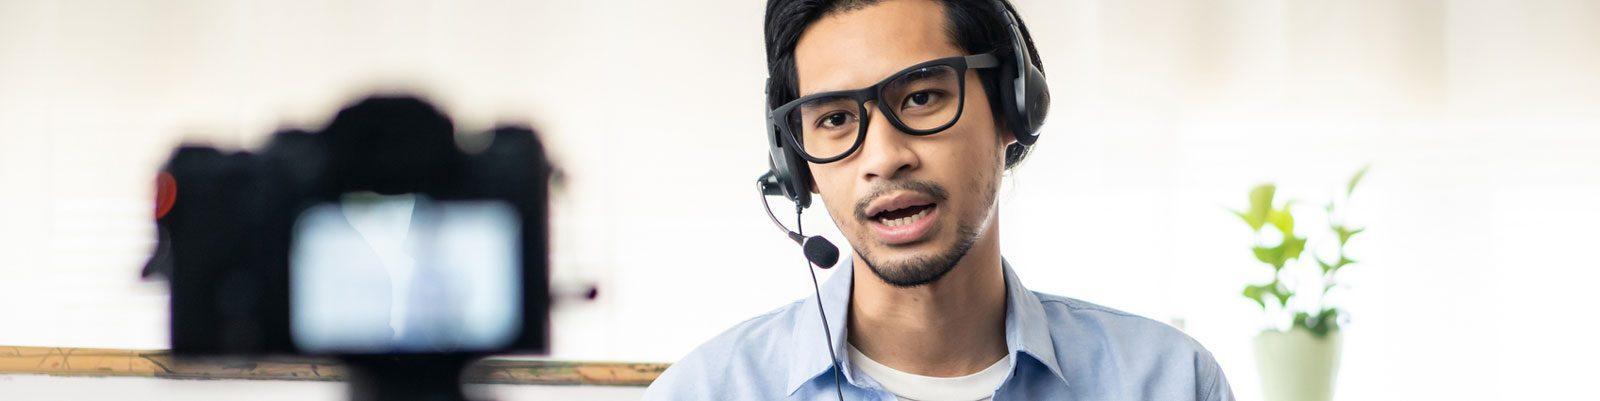 Man wearing headset speaks in front of camera